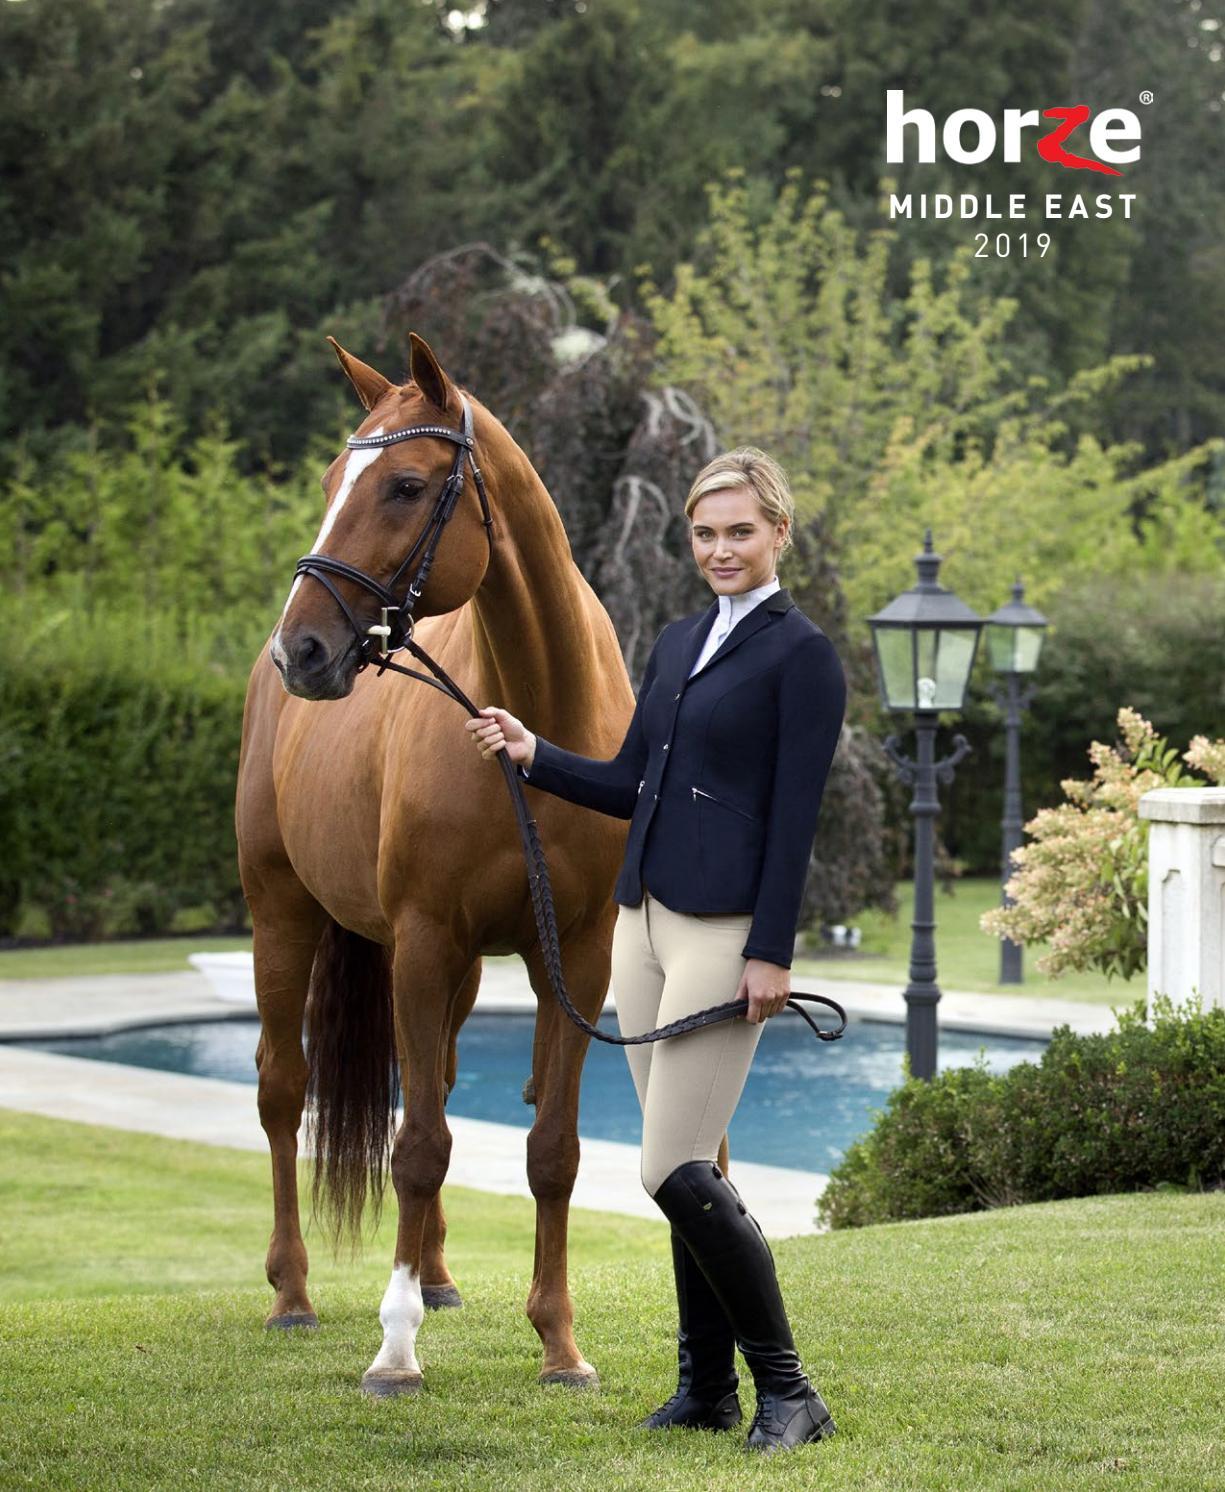 Non Rub Chafe Horze All Purpose Breathable Nylon Neoprene Horse Riding Girth